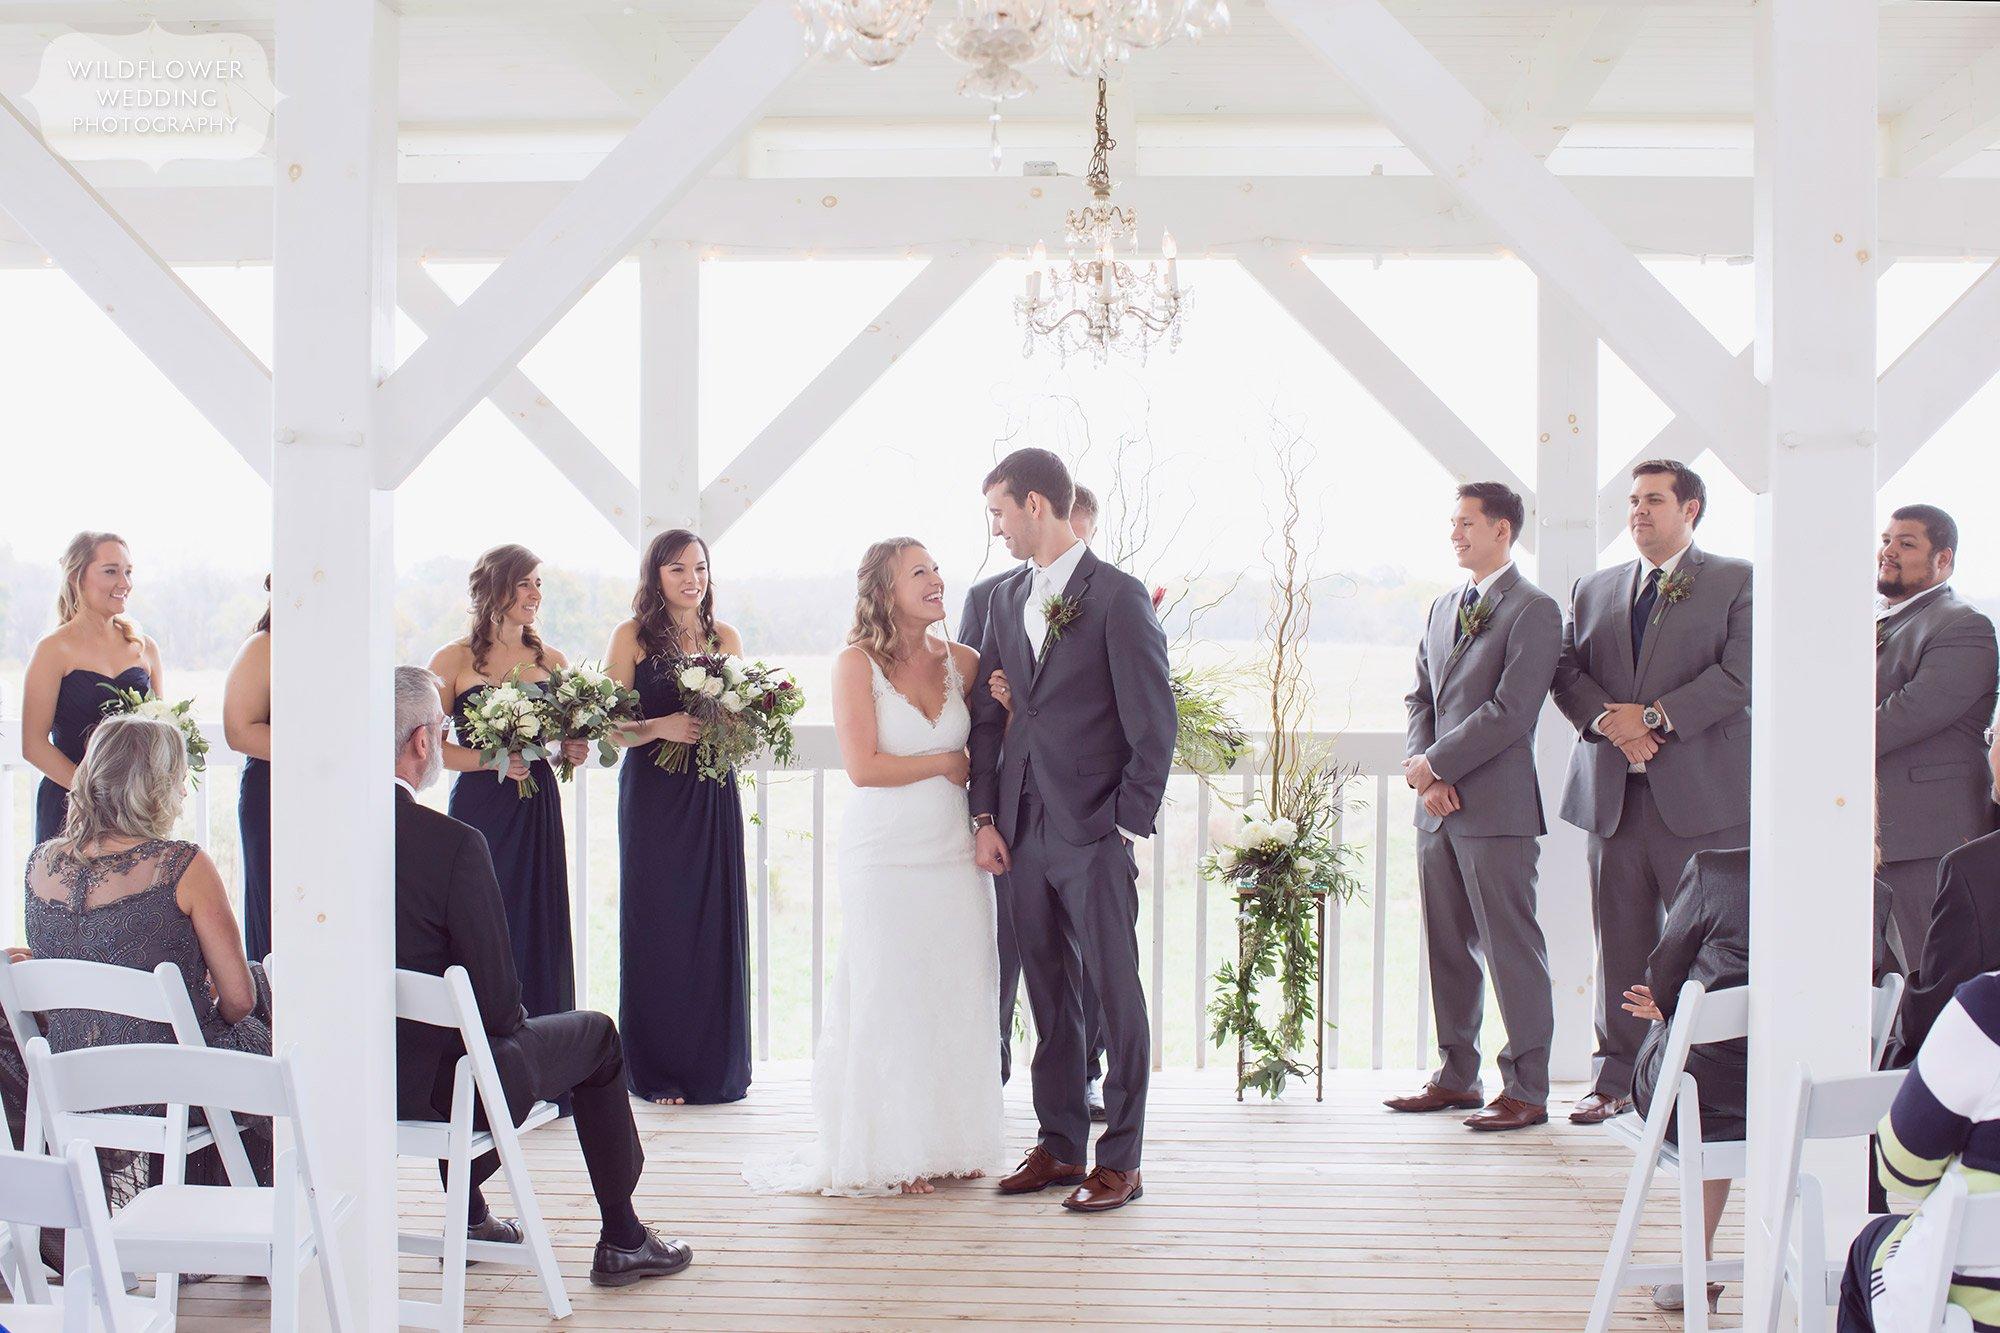 Blue Bell Farm Wedding in November - Rustic White Barn Reception ...